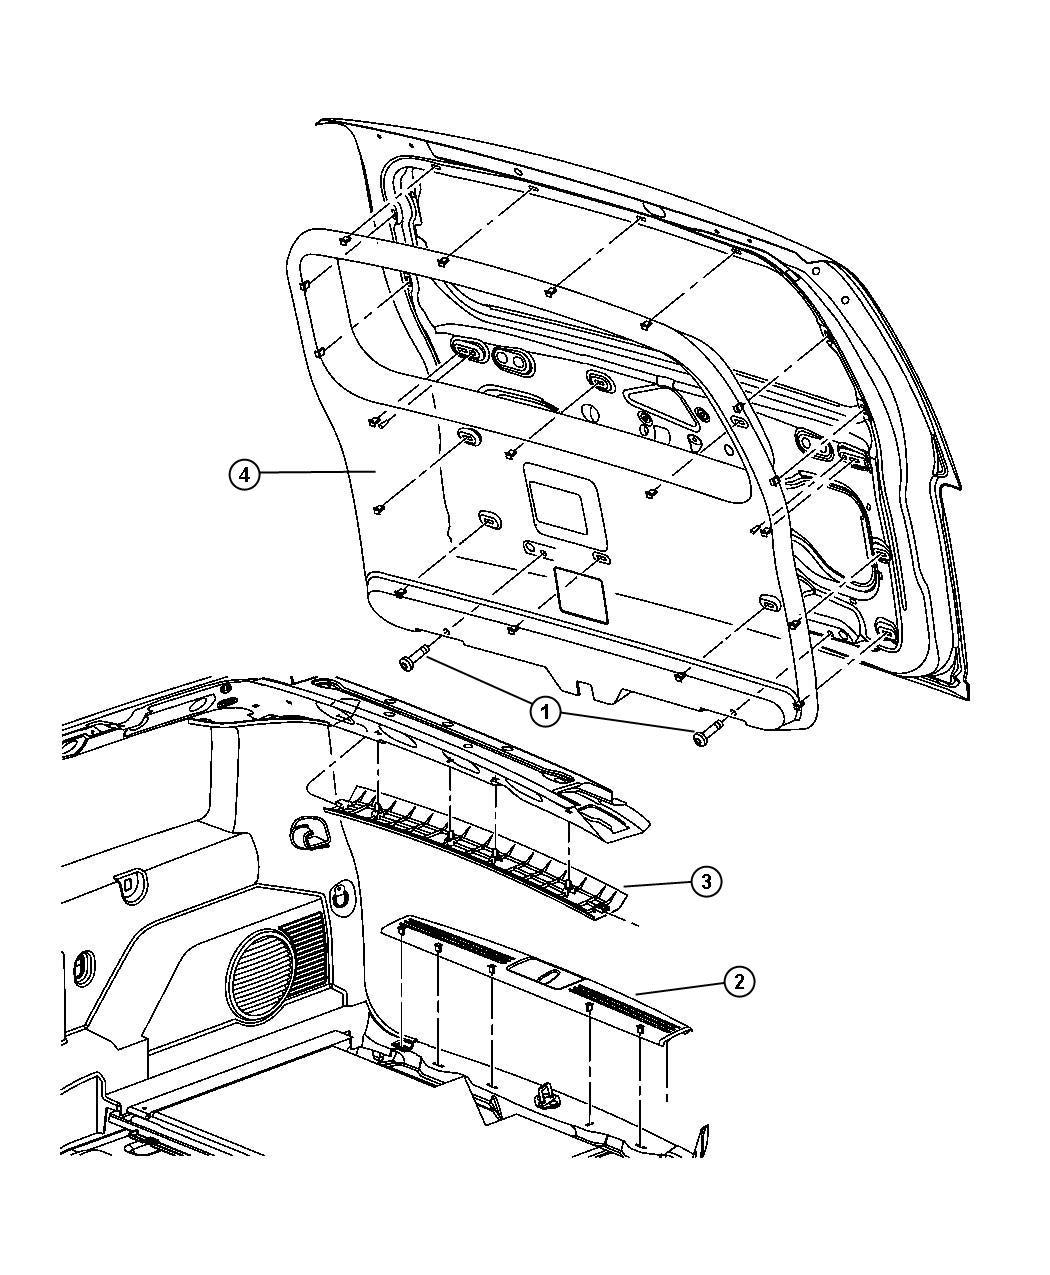 2010 Jeep Liberty Plate. Liftgate scuff. [dt], [dv]. Trim